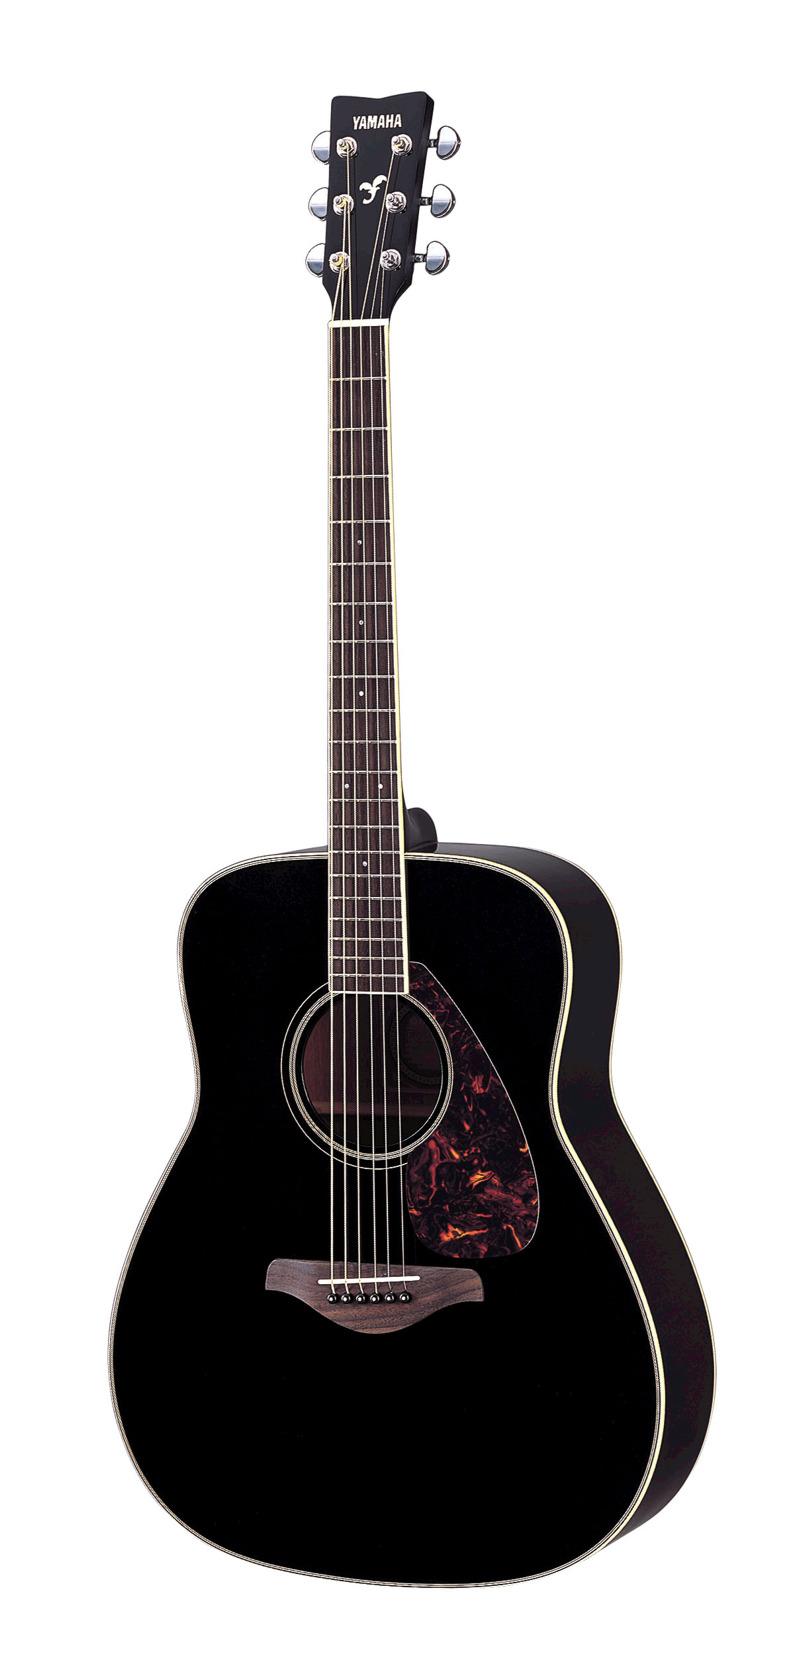 yamaha fx370c elektroakustische gitarre mit cutaway natur. Black Bedroom Furniture Sets. Home Design Ideas